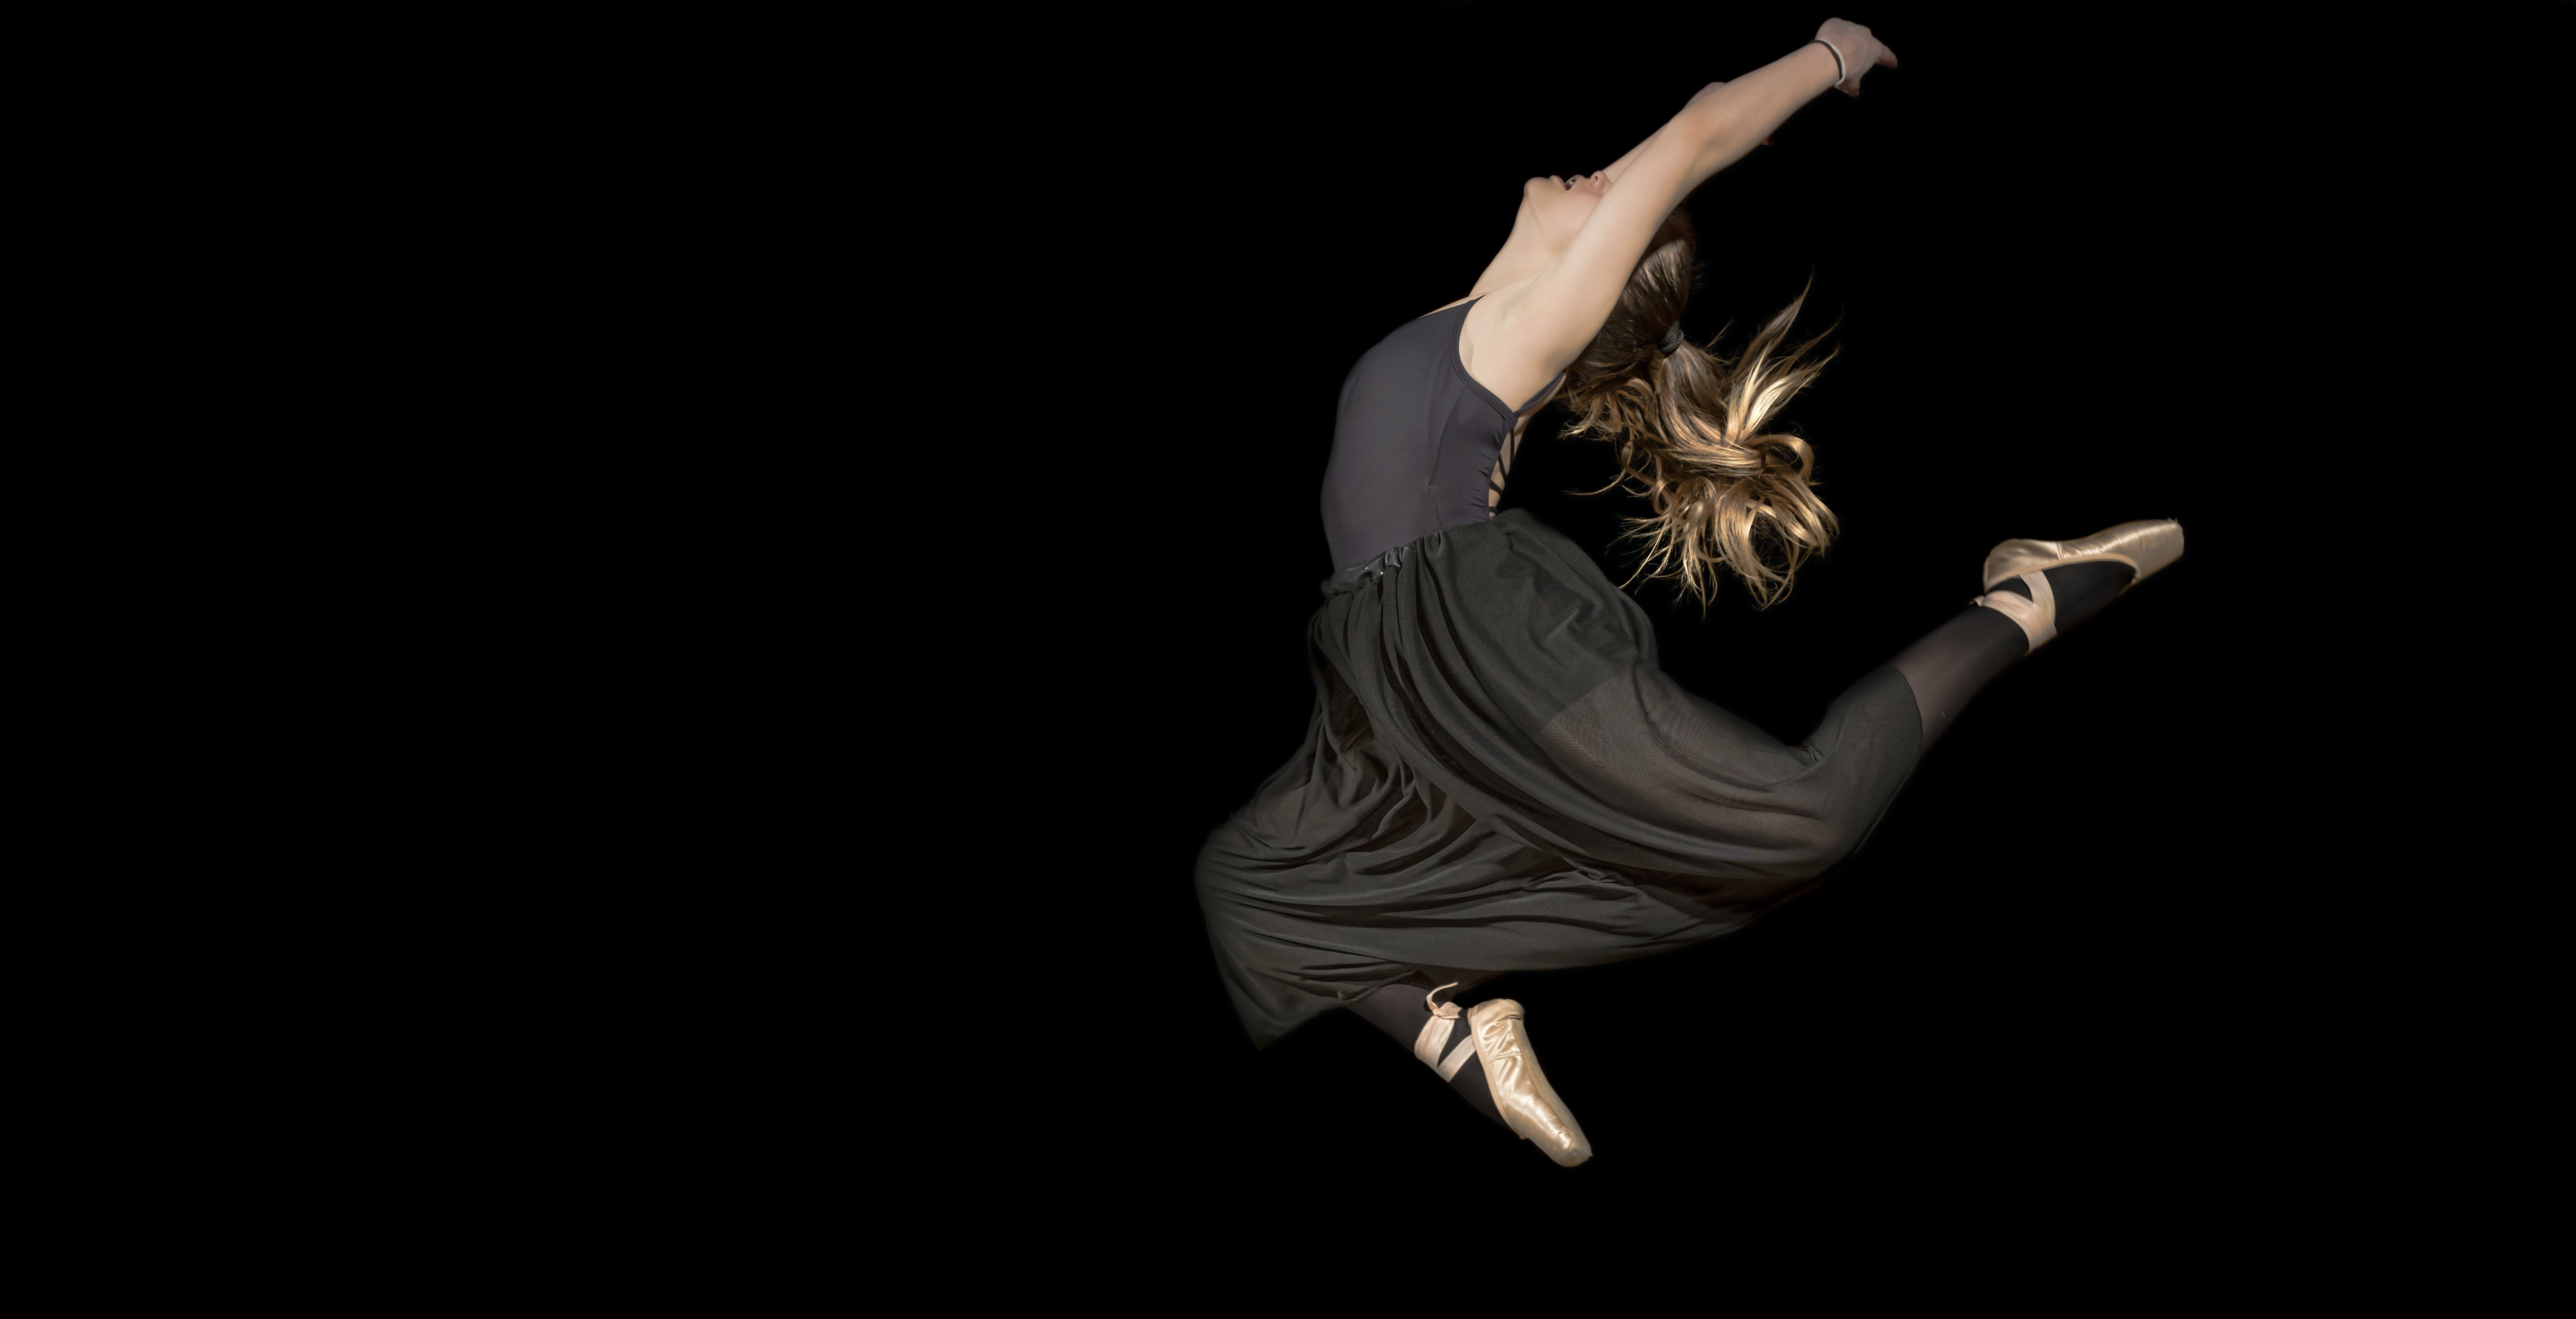 Woman in Black Sleeveless Shirt and Pants Jumping